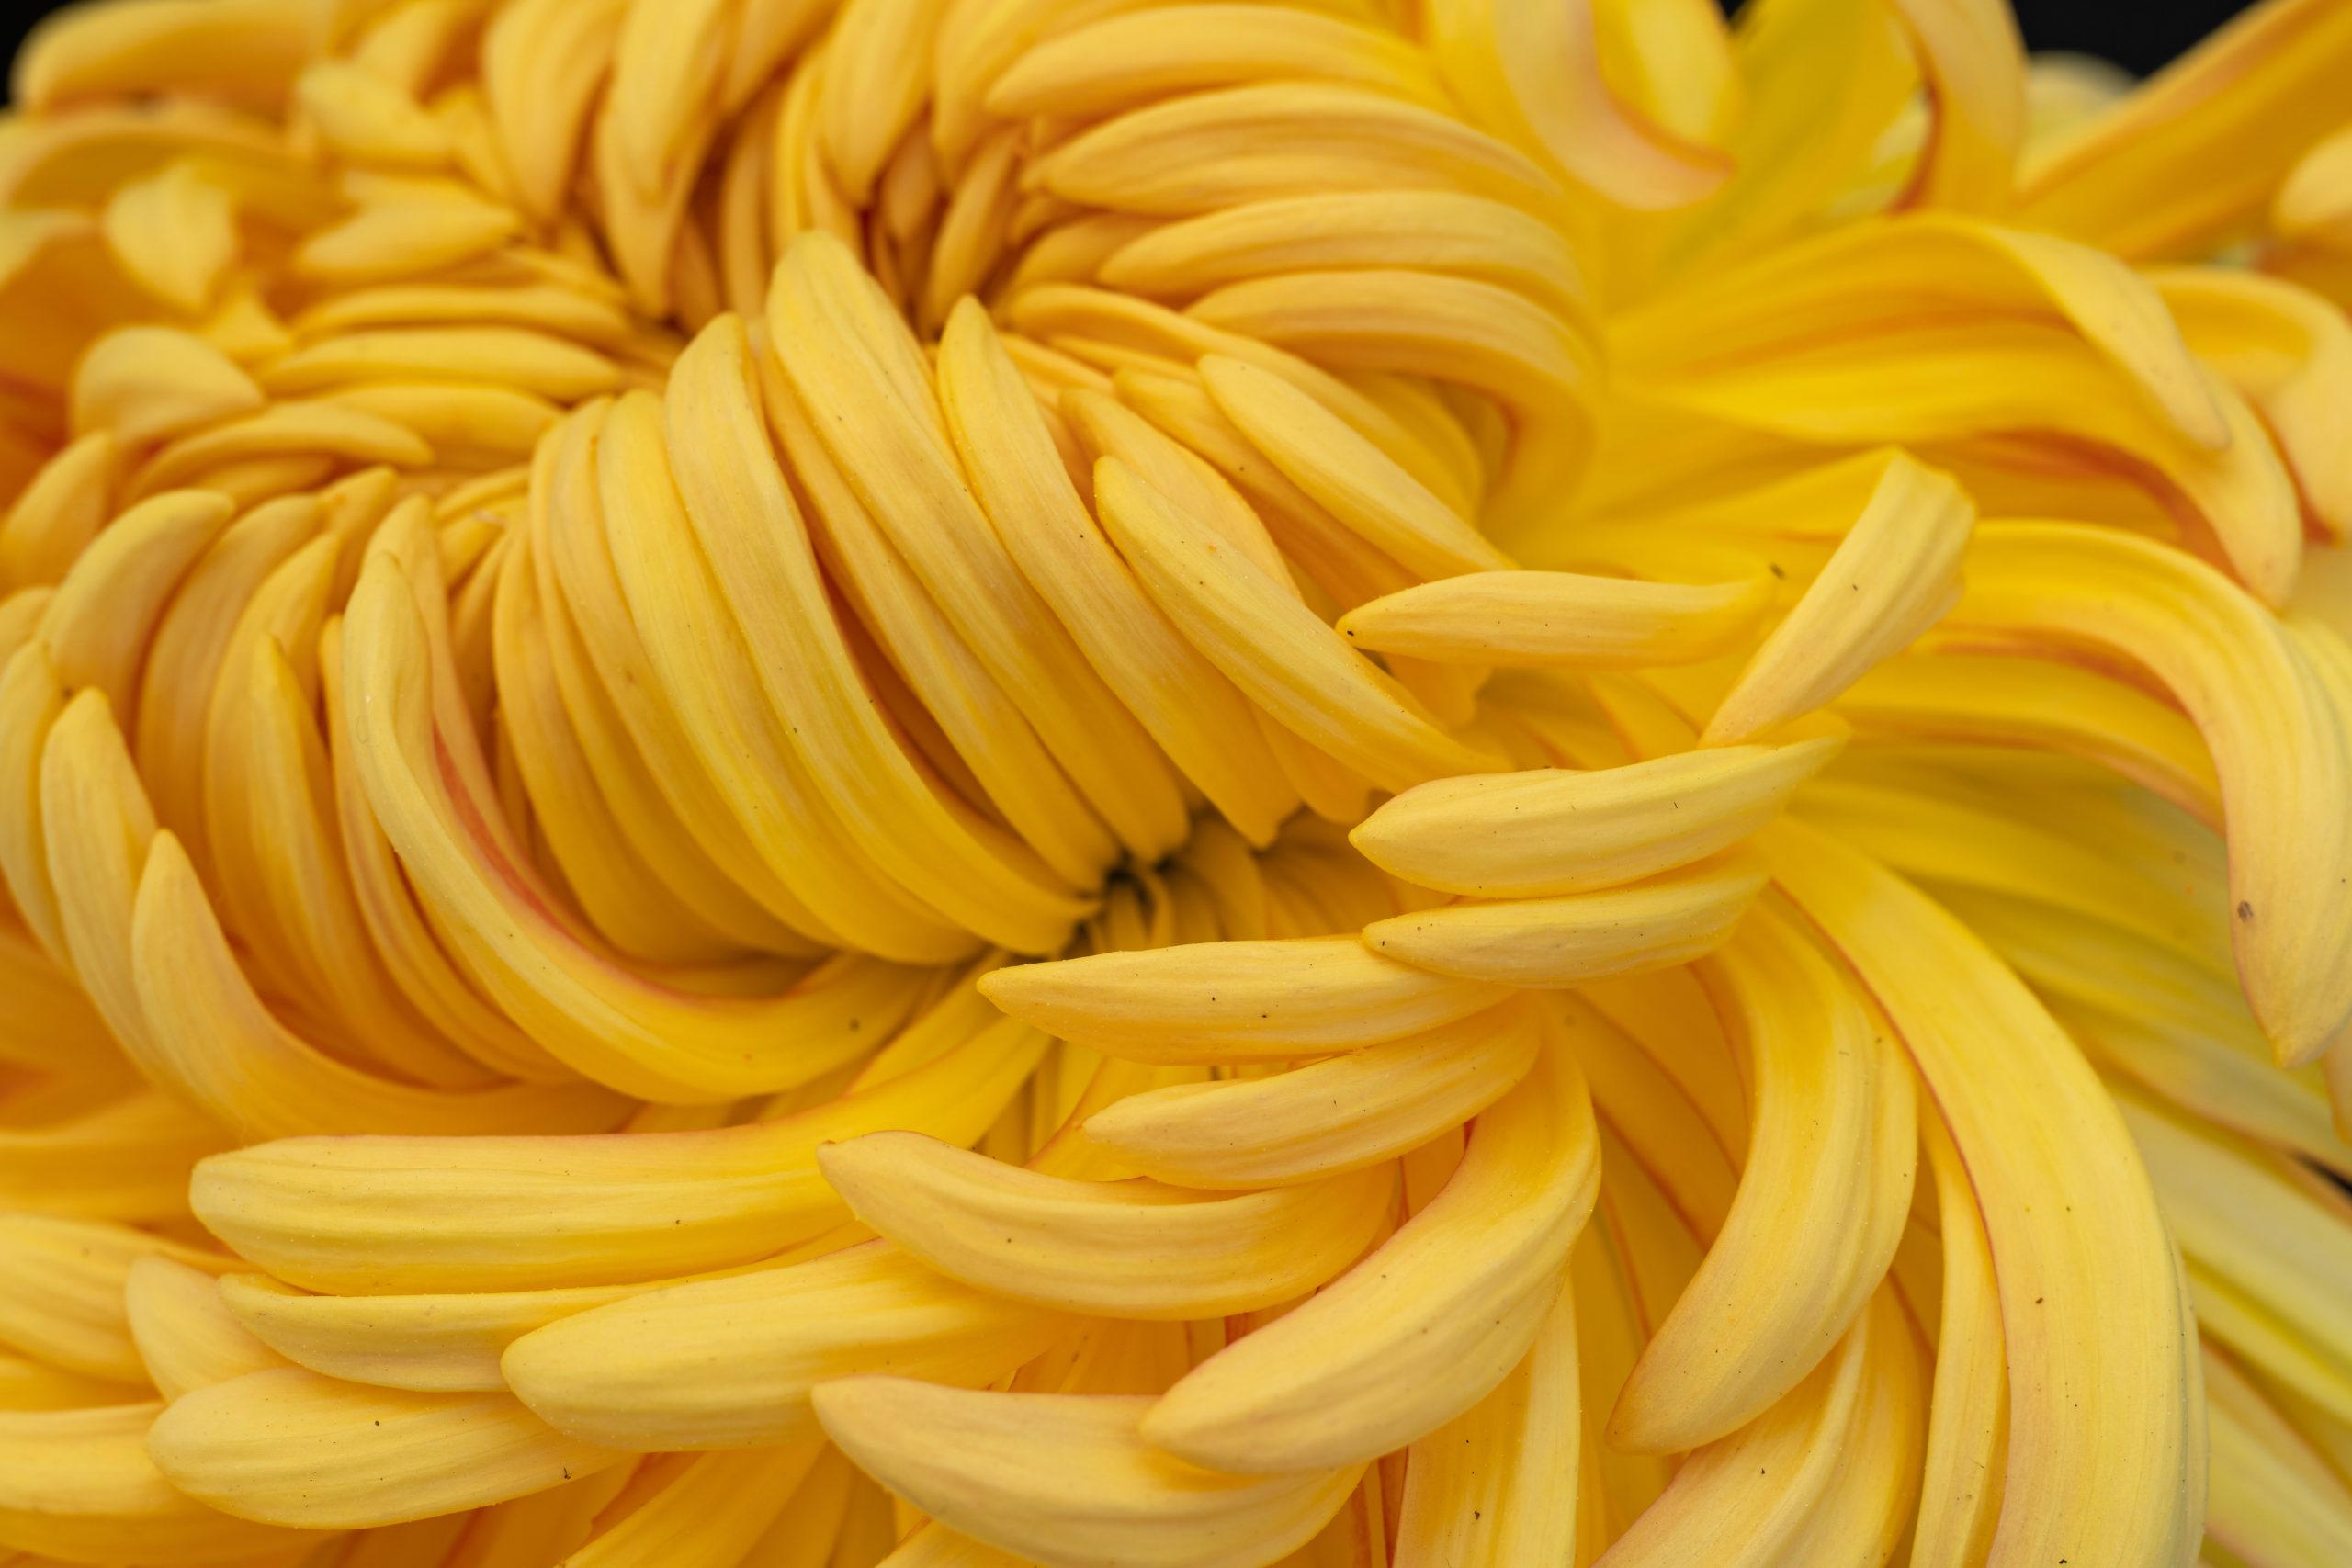 Florists' daisy yellow